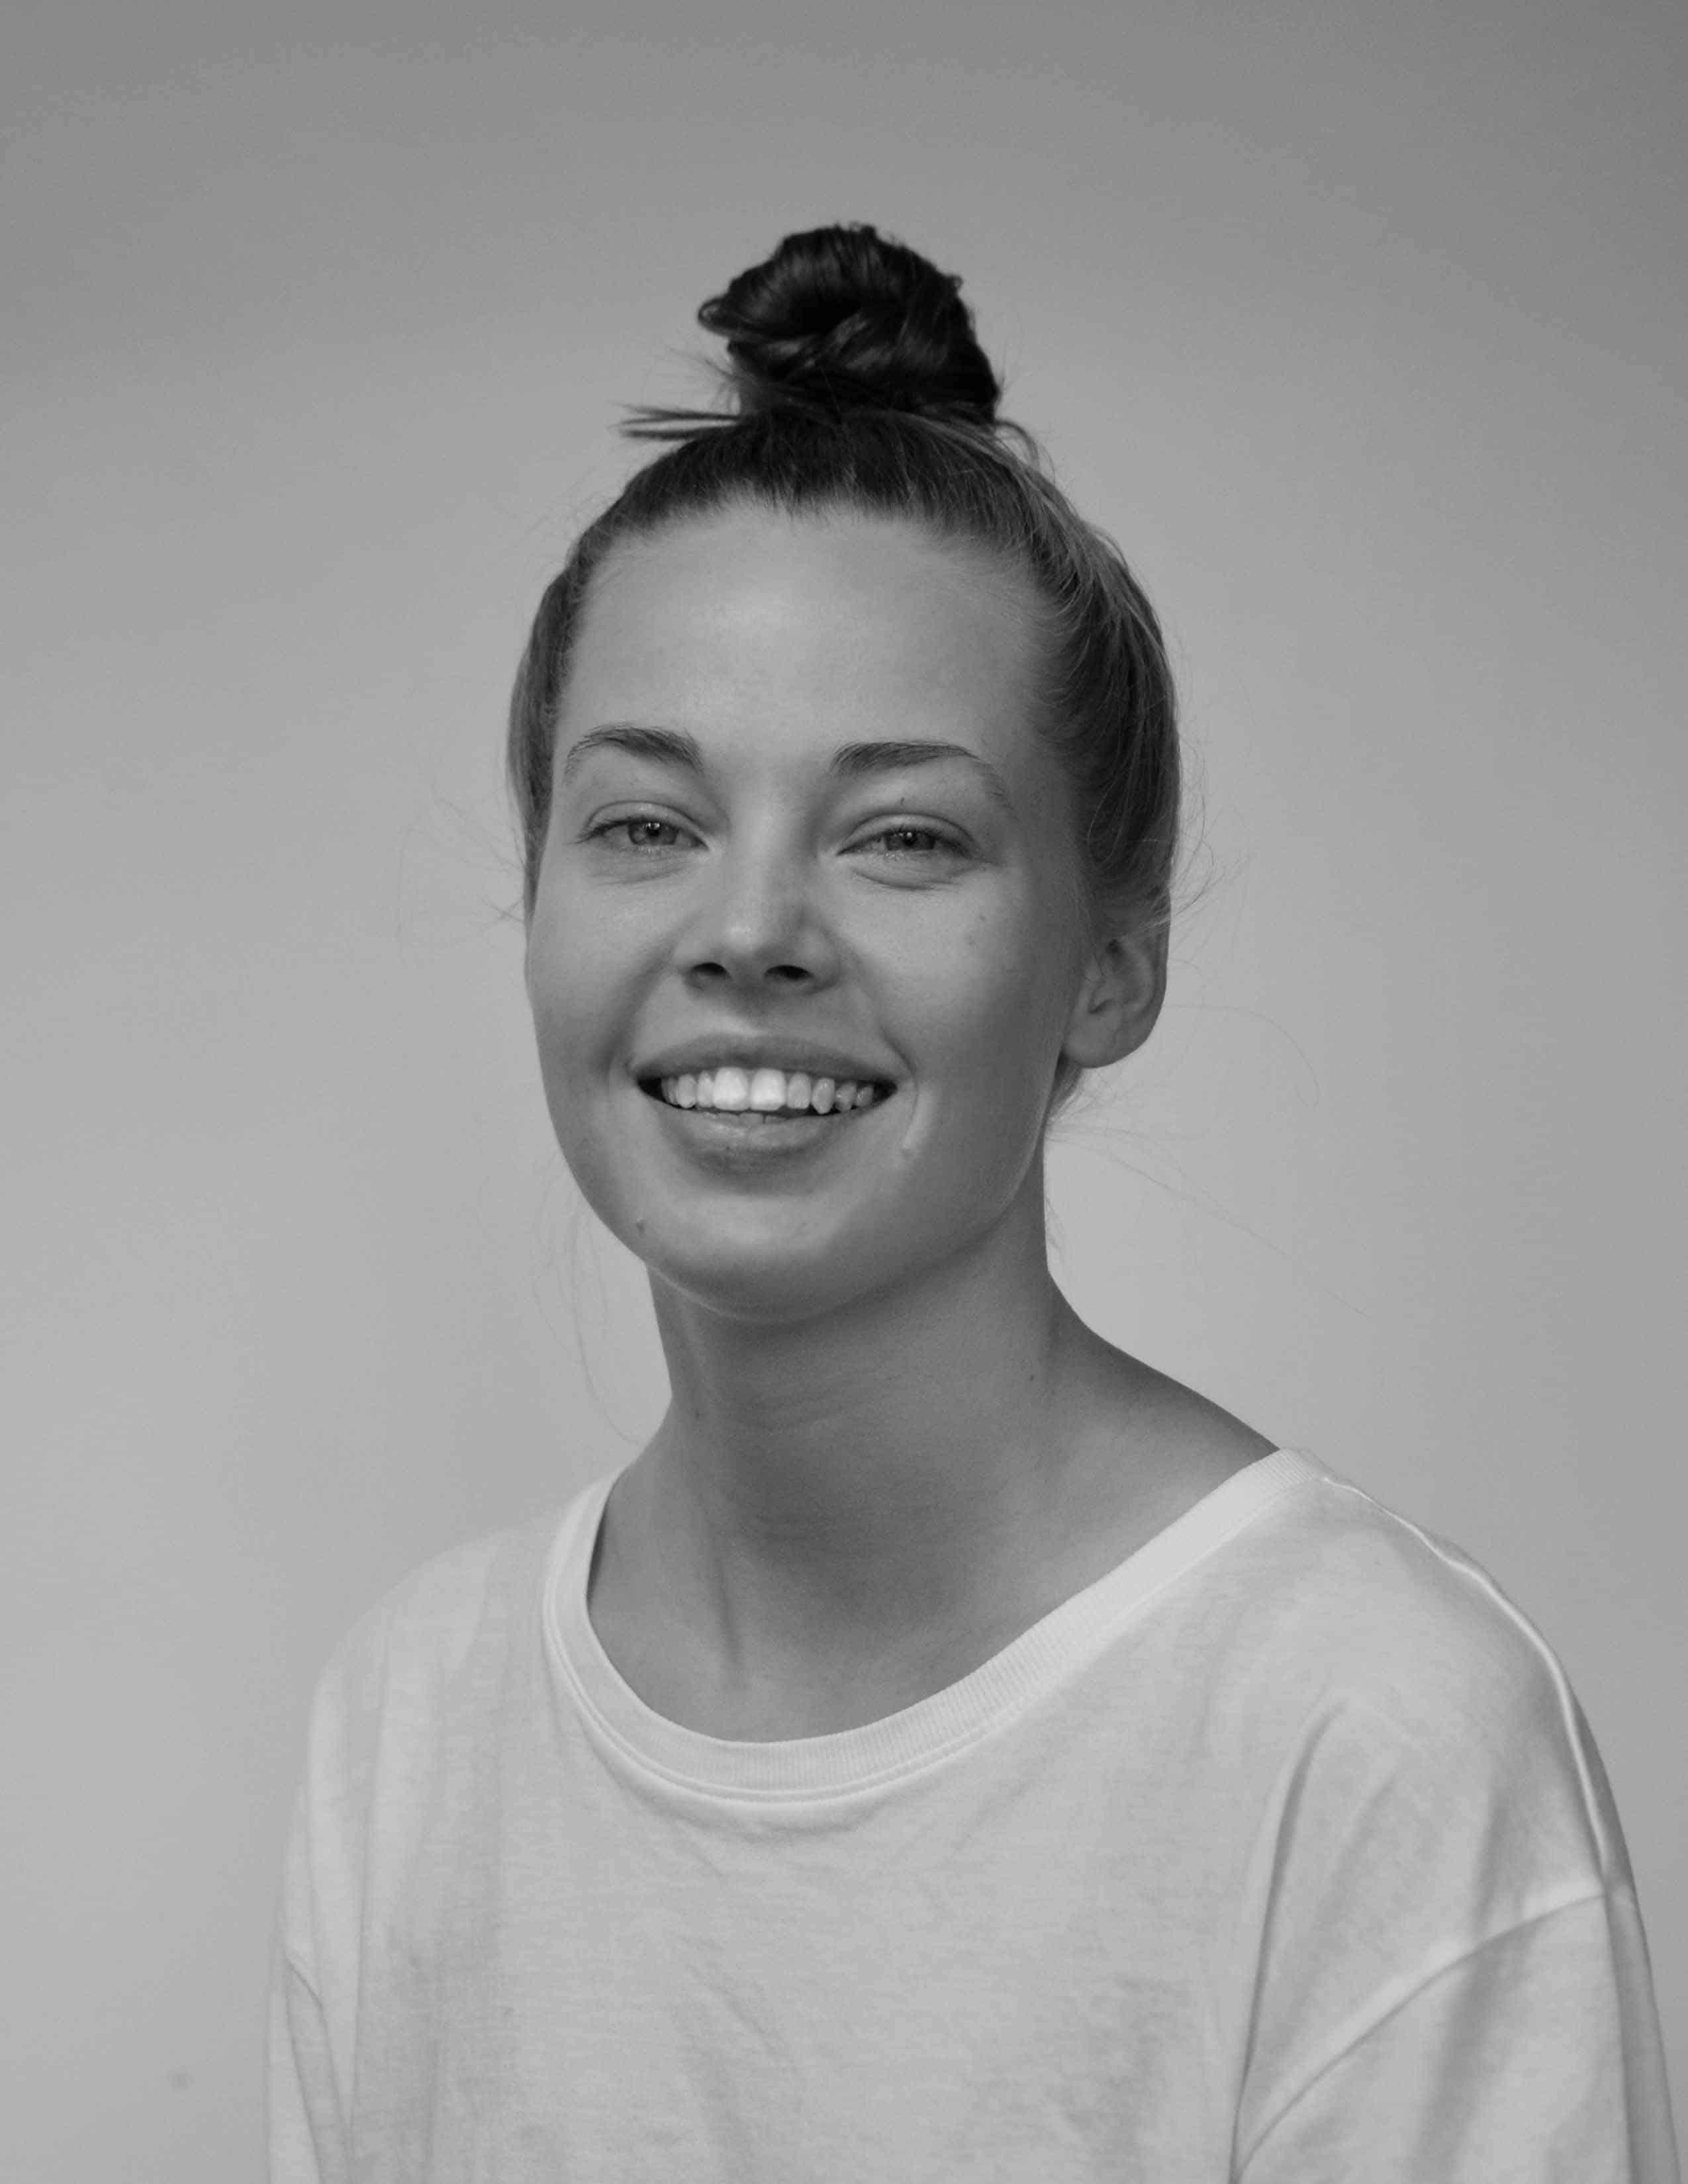 Erla Andersson